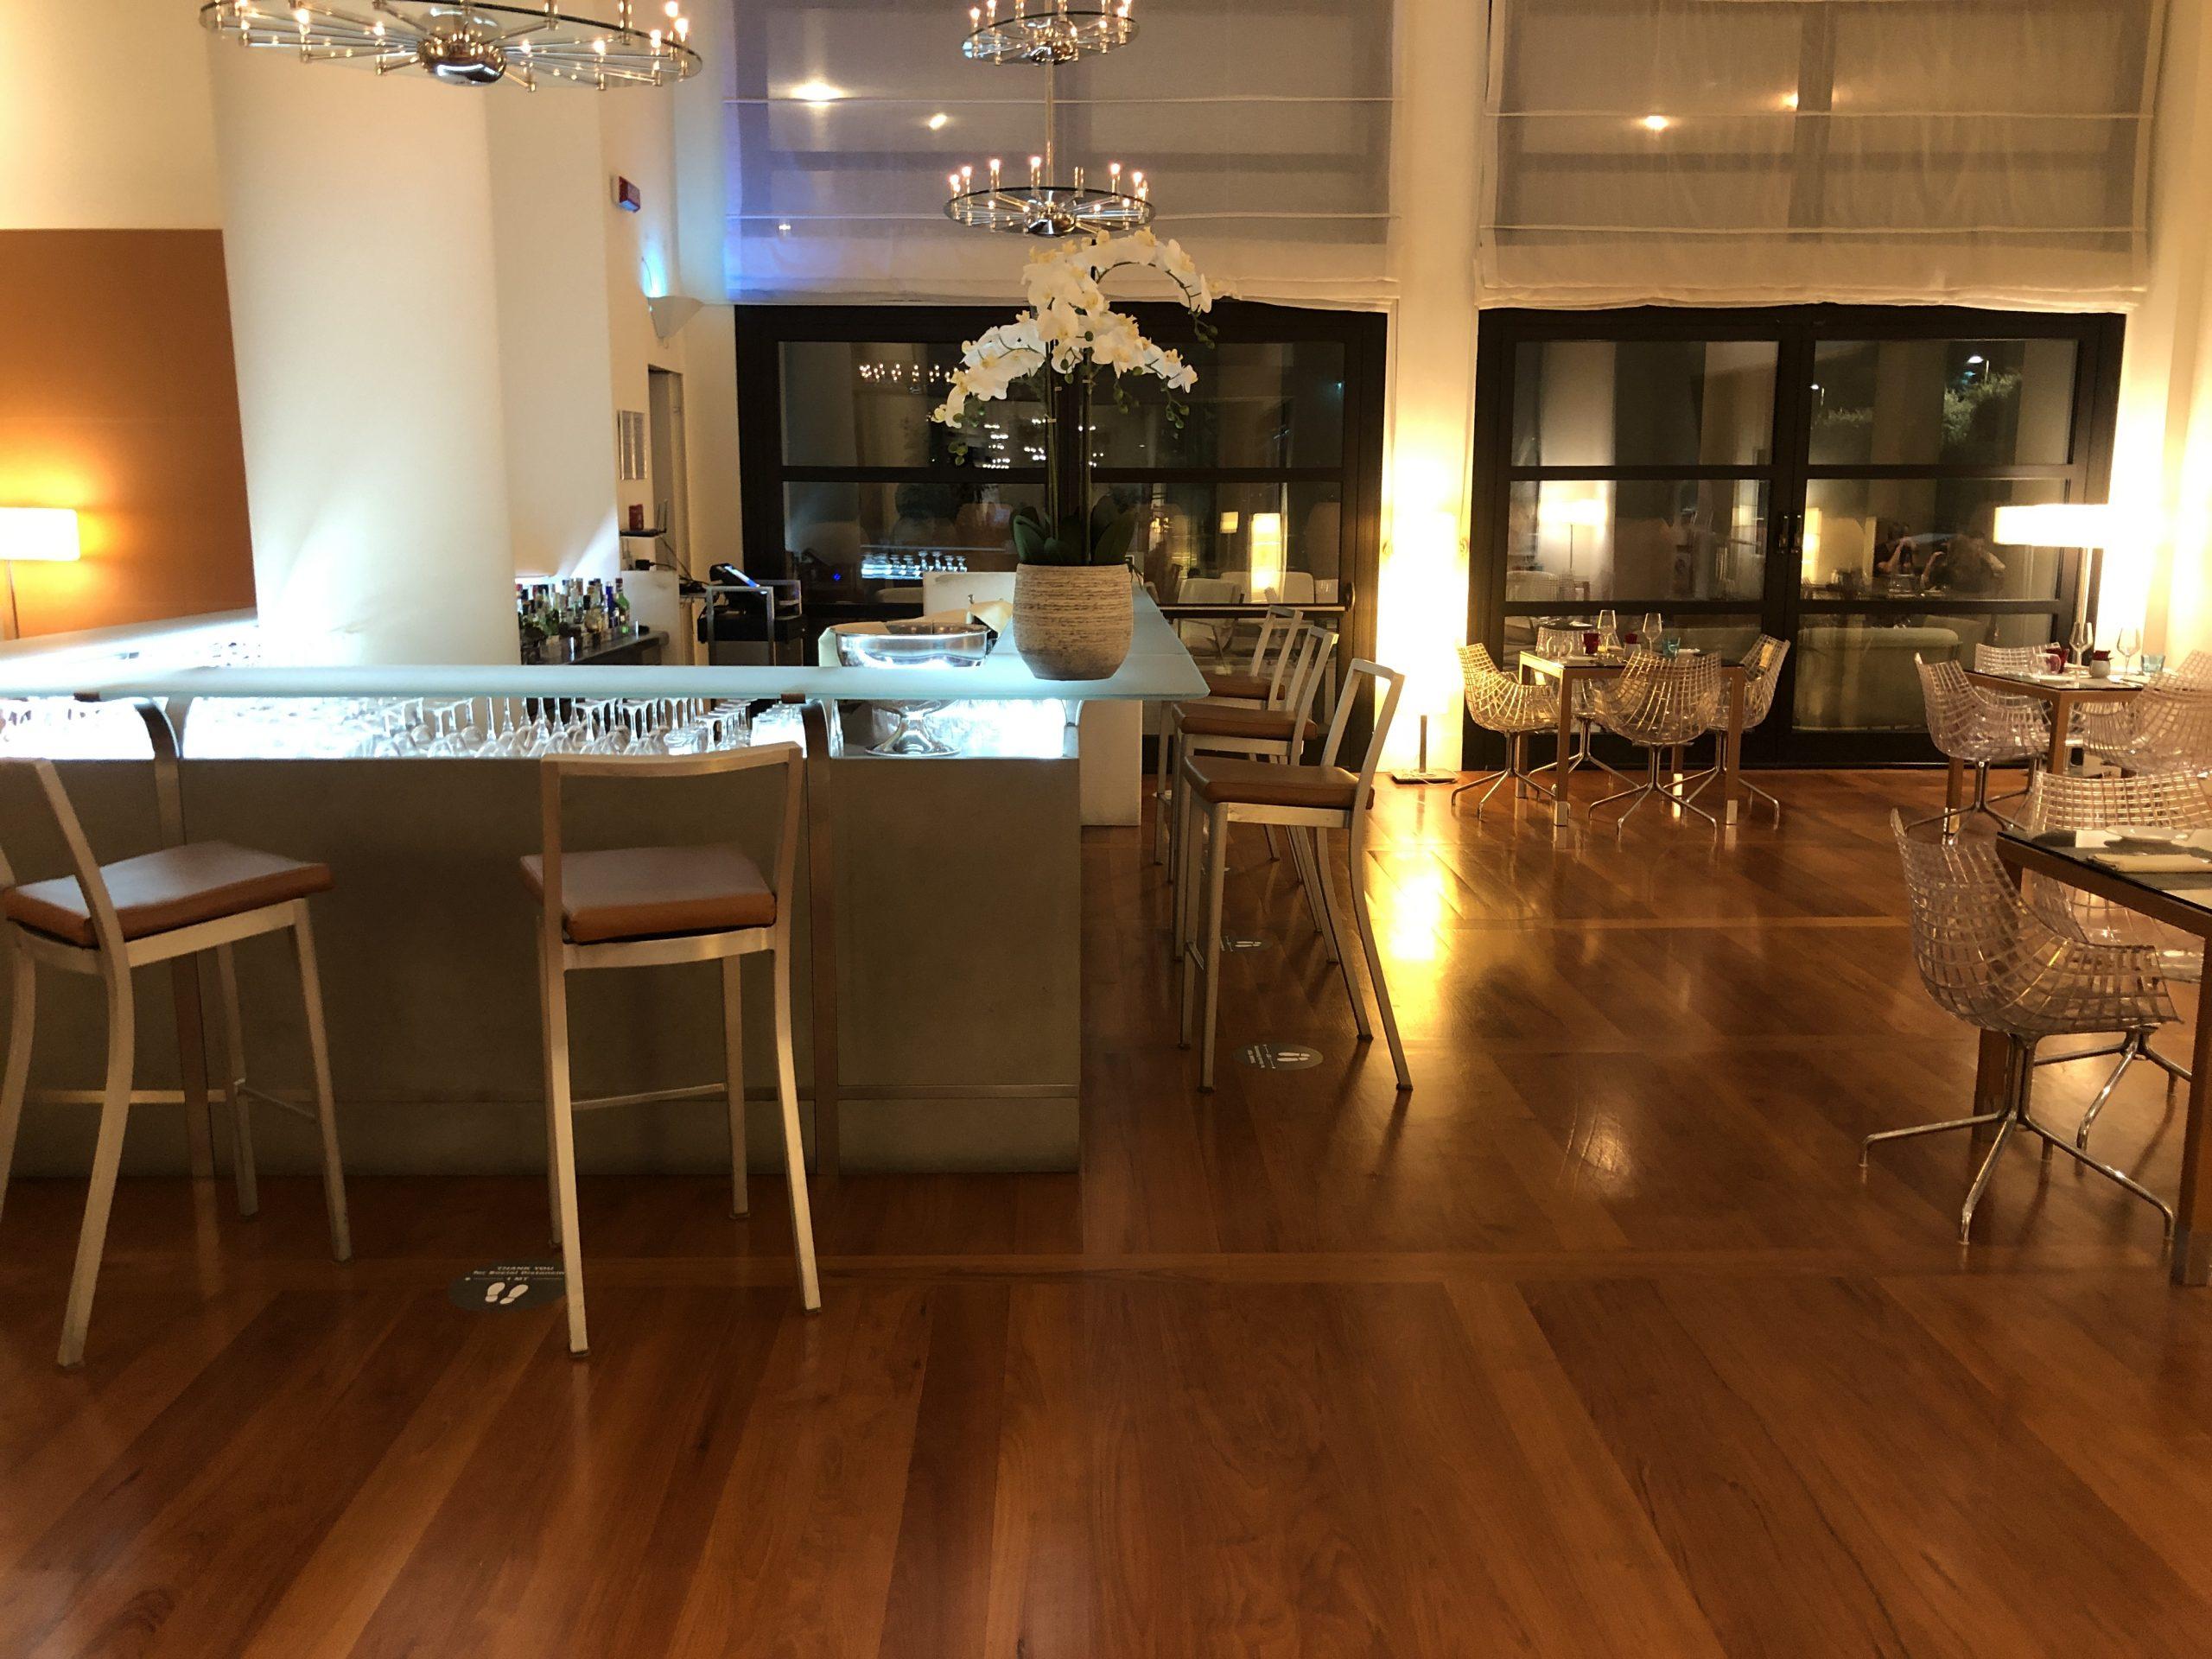 Hotel Review : ヒルトンガーデンイン フローレンス ノーボリ(Hilton Garden Inn Florence Novoli)